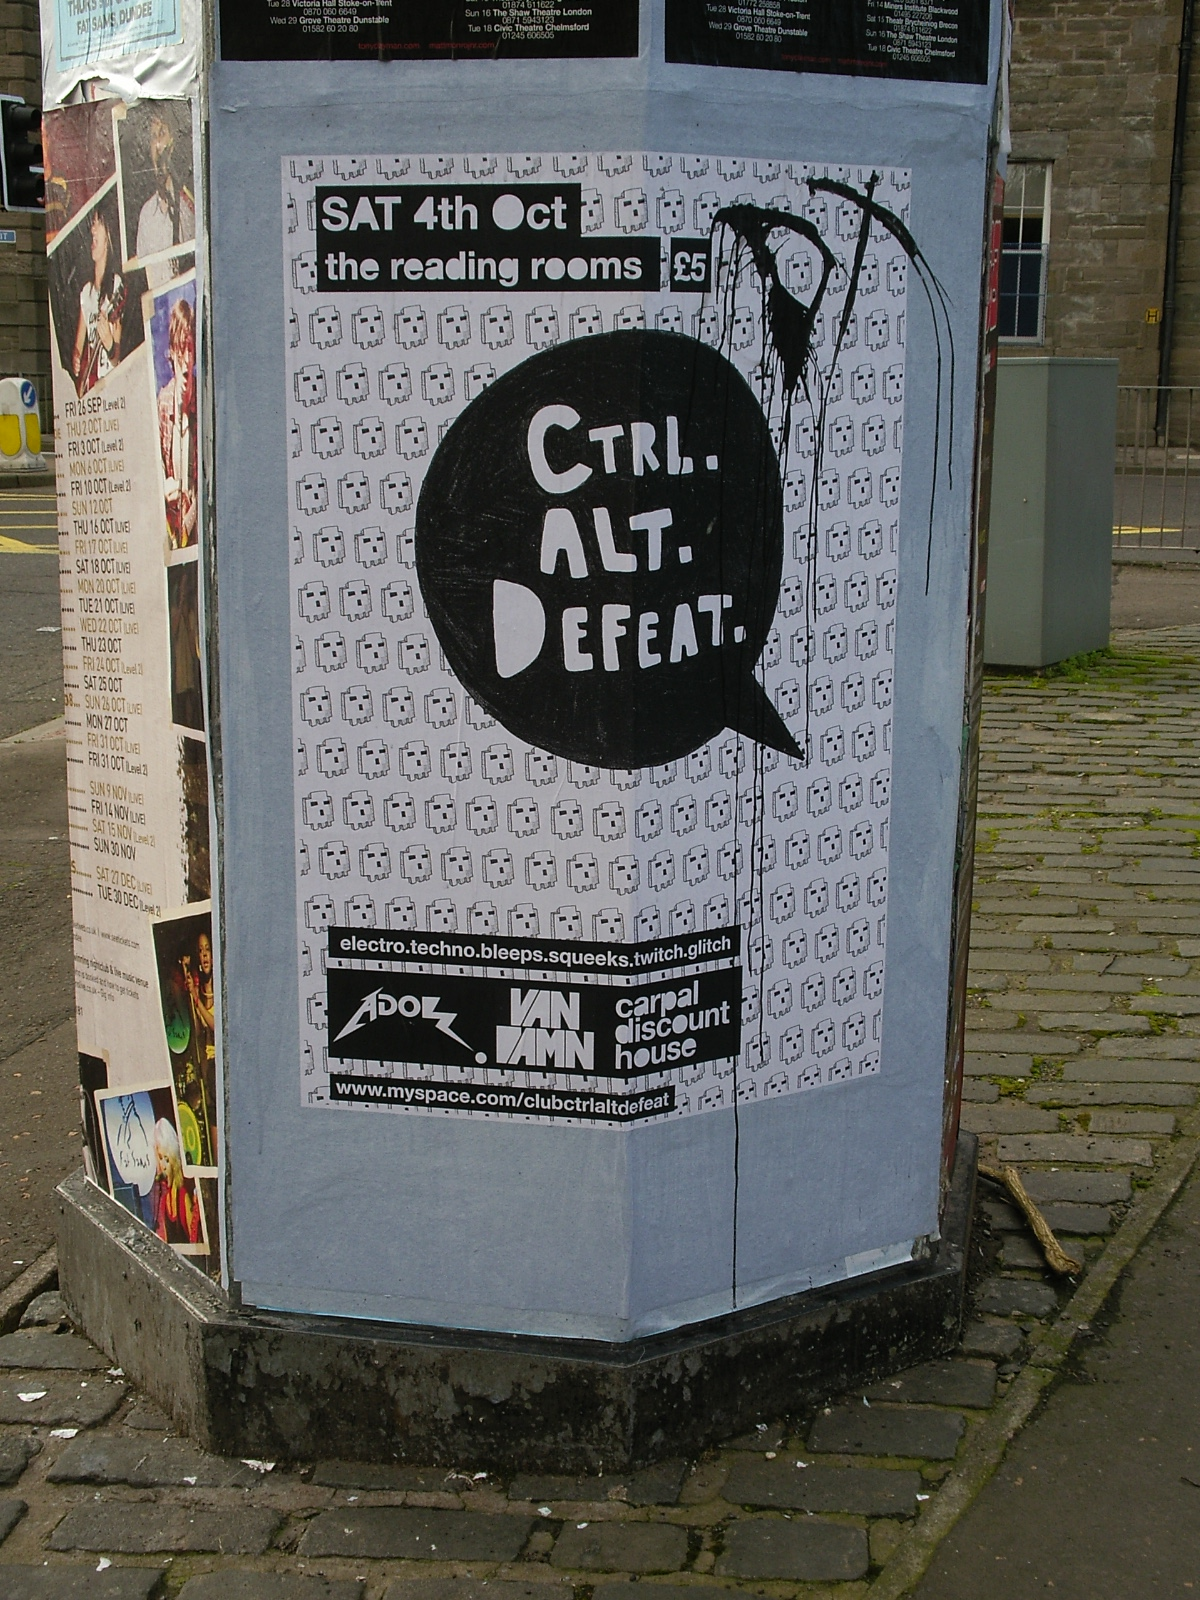 Band named Ctrl-Alt-Defeat